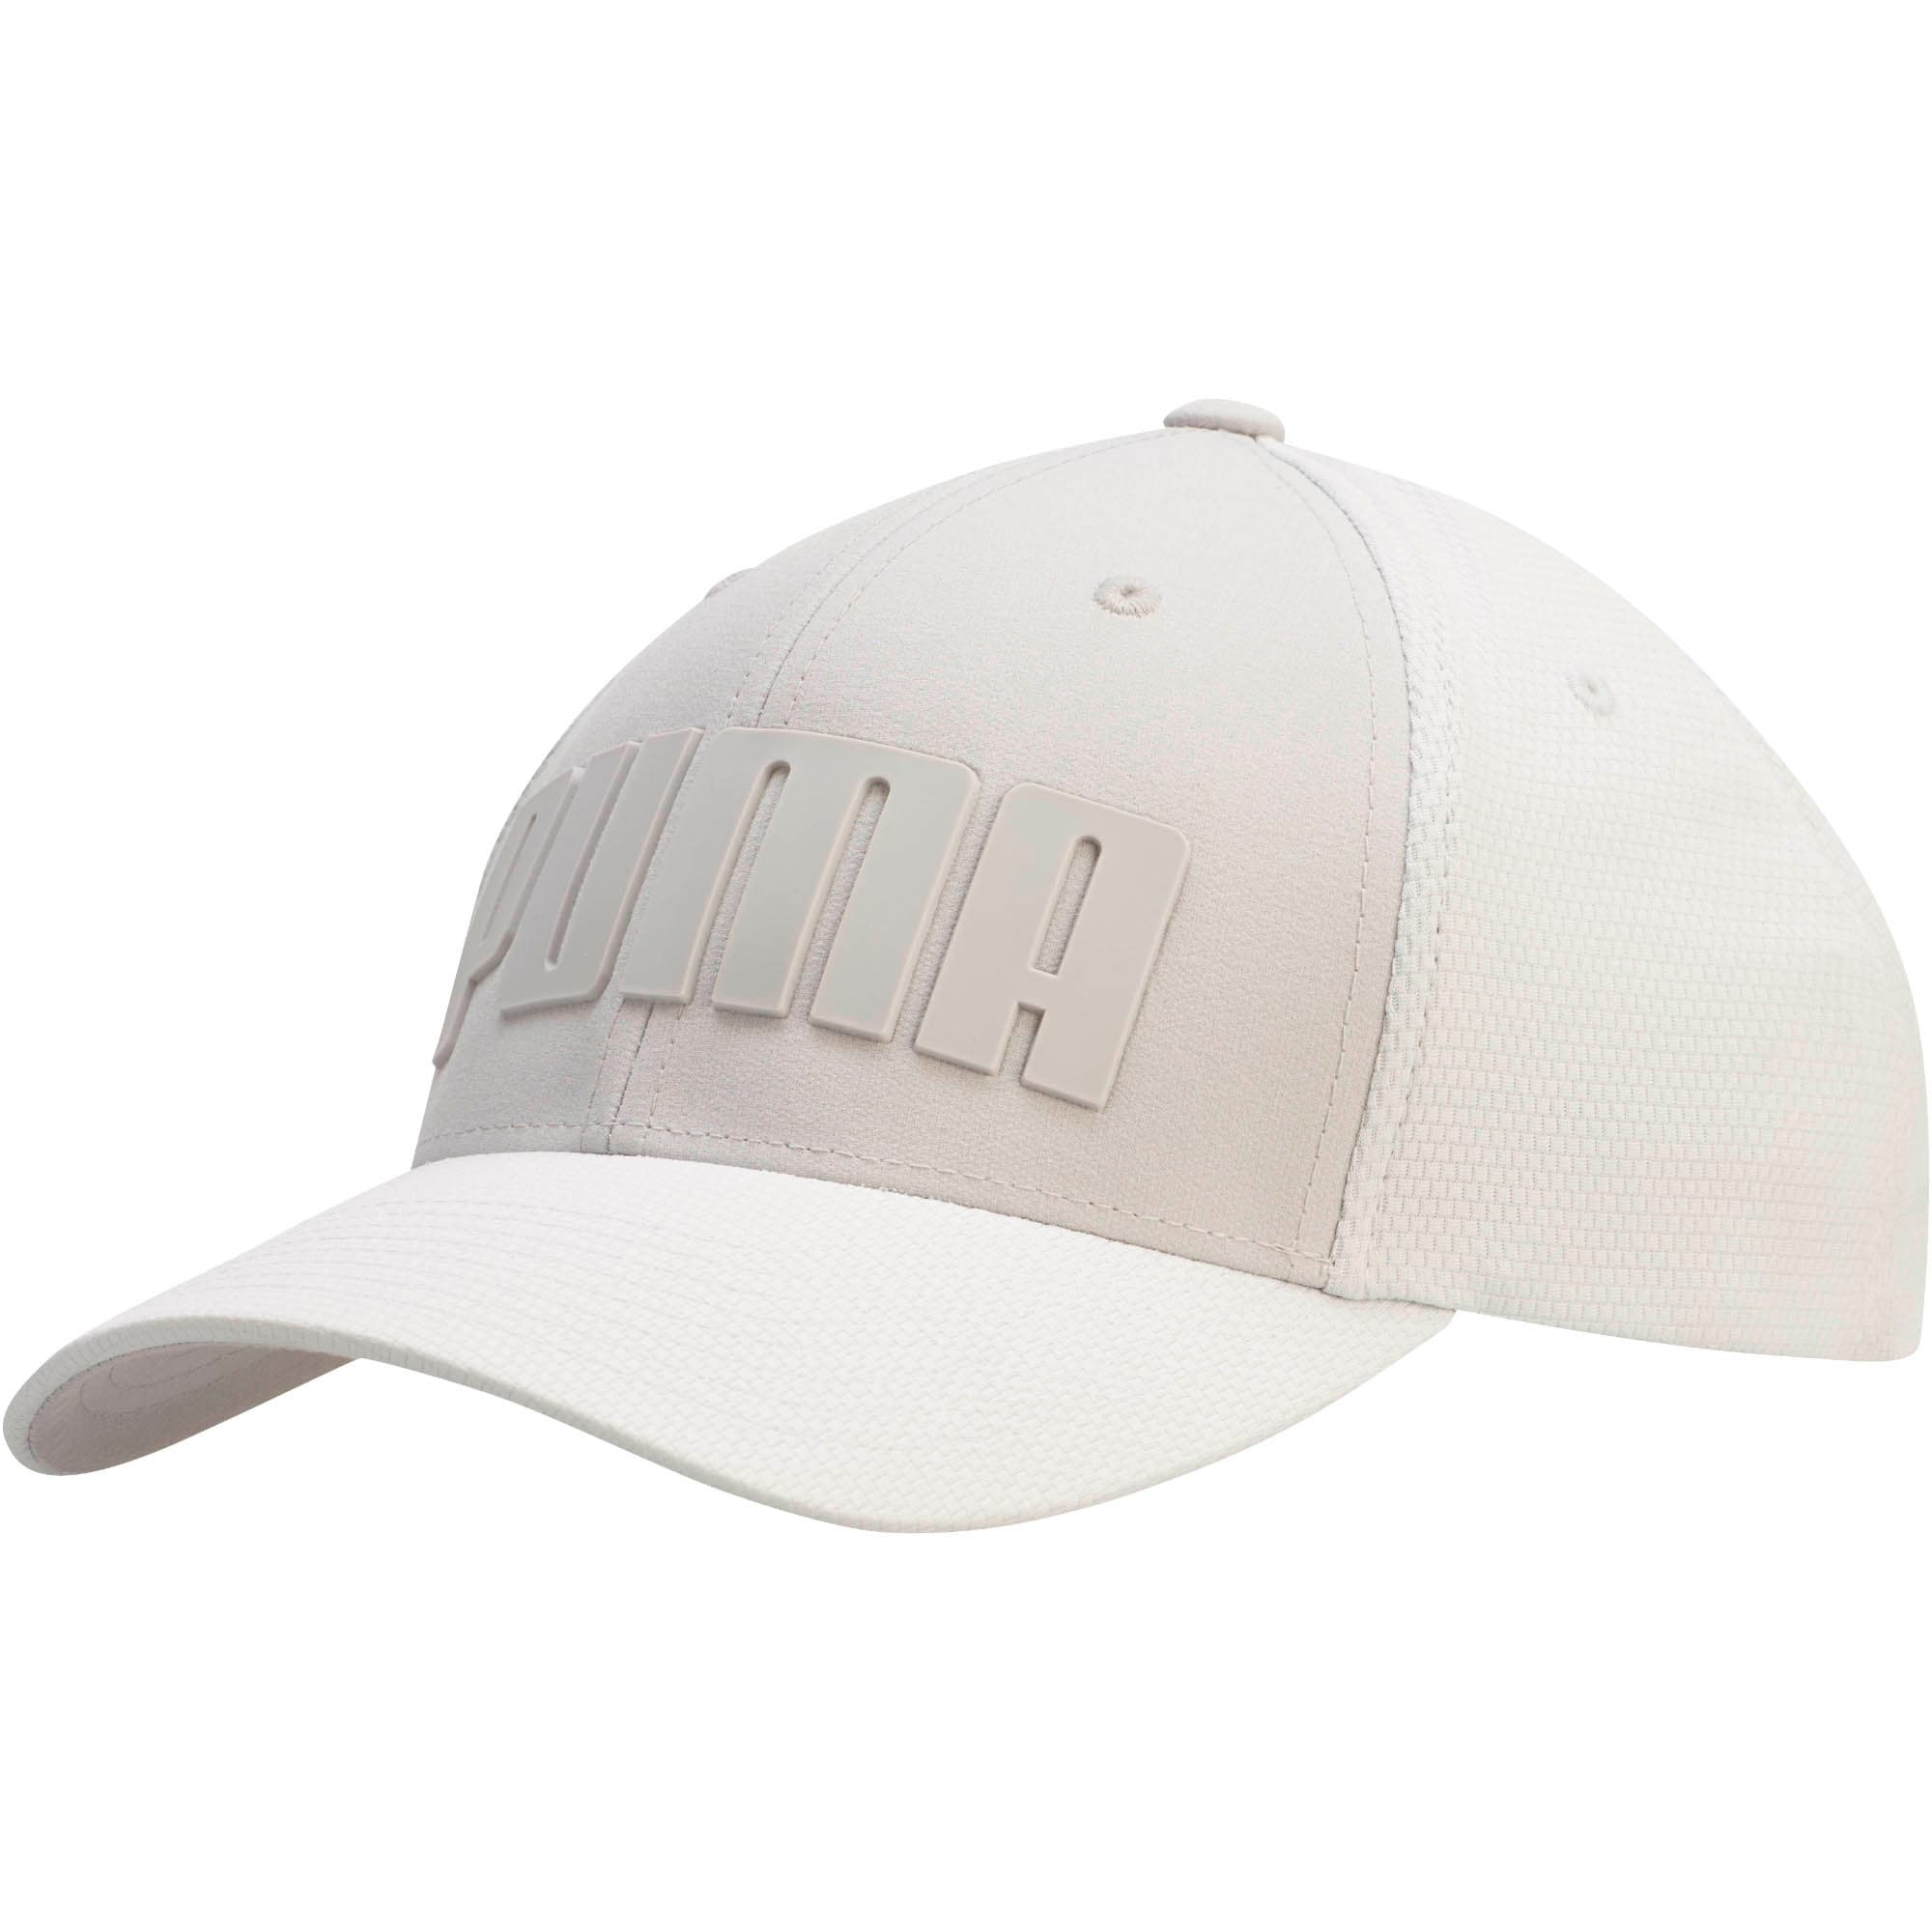 Thumbnail 1 of Mono Cubic Trucker Hat, Quarry, medium